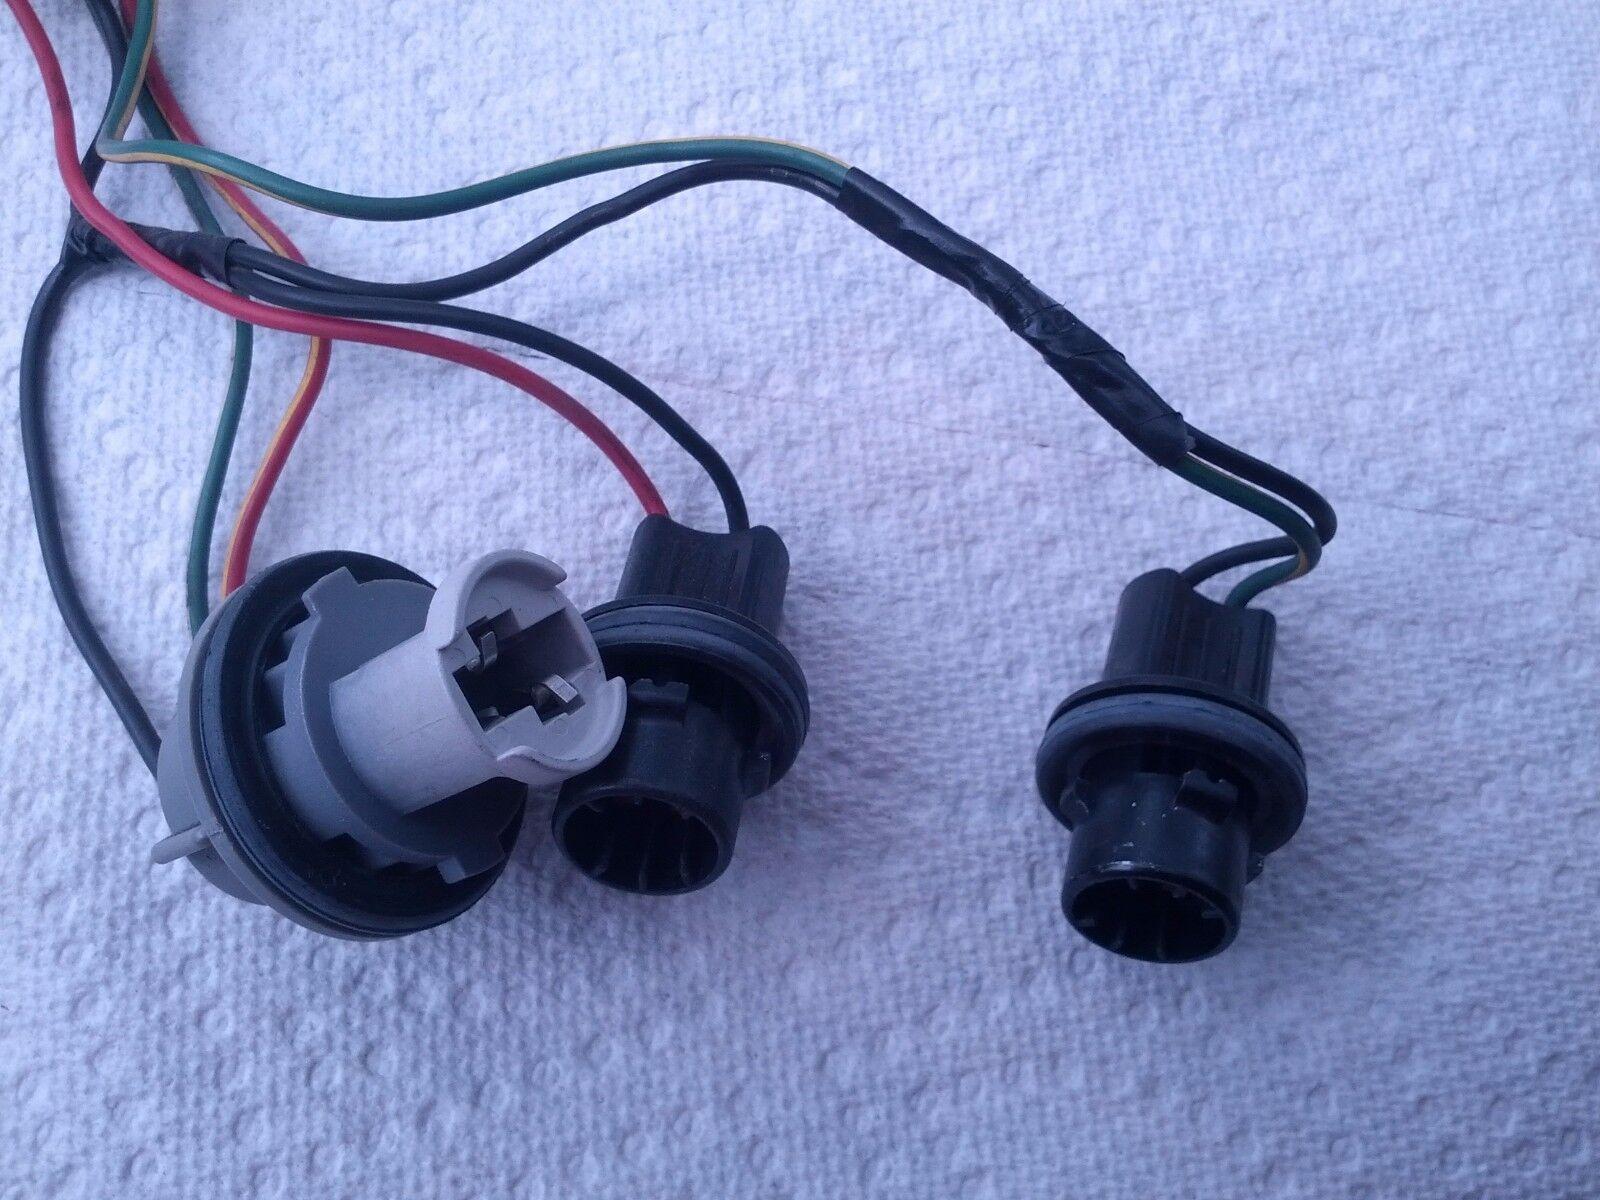 used suzuki grand vitara tracker lx7 tail light wiring. Black Bedroom Furniture Sets. Home Design Ideas